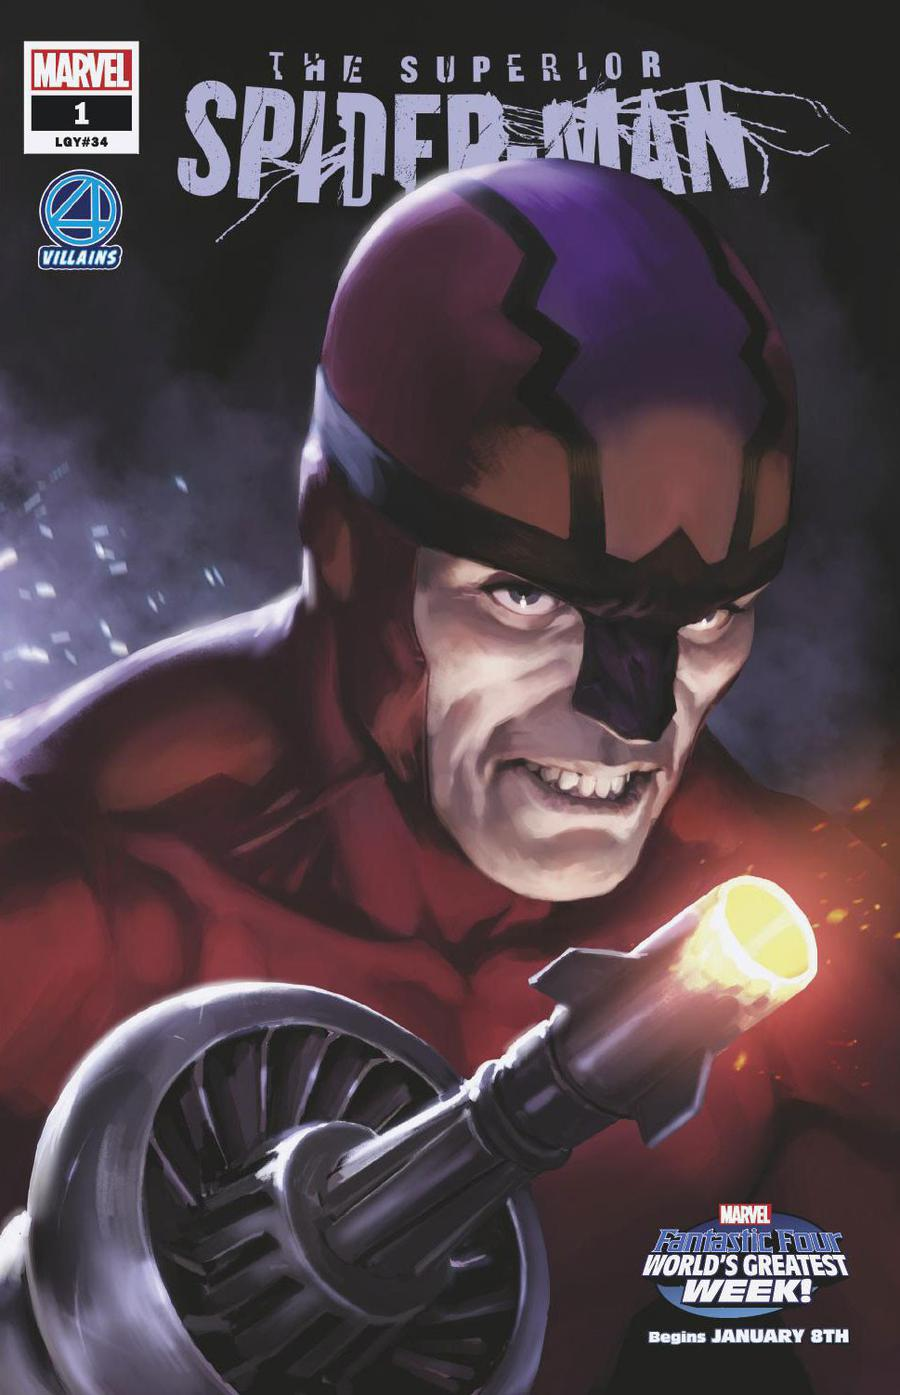 Superior Spider-Man Vol 2 #1 Cover B Variant Marko Djurdjevic Fantastic Four Villains Cover (Spider-Geddon Tie-In)